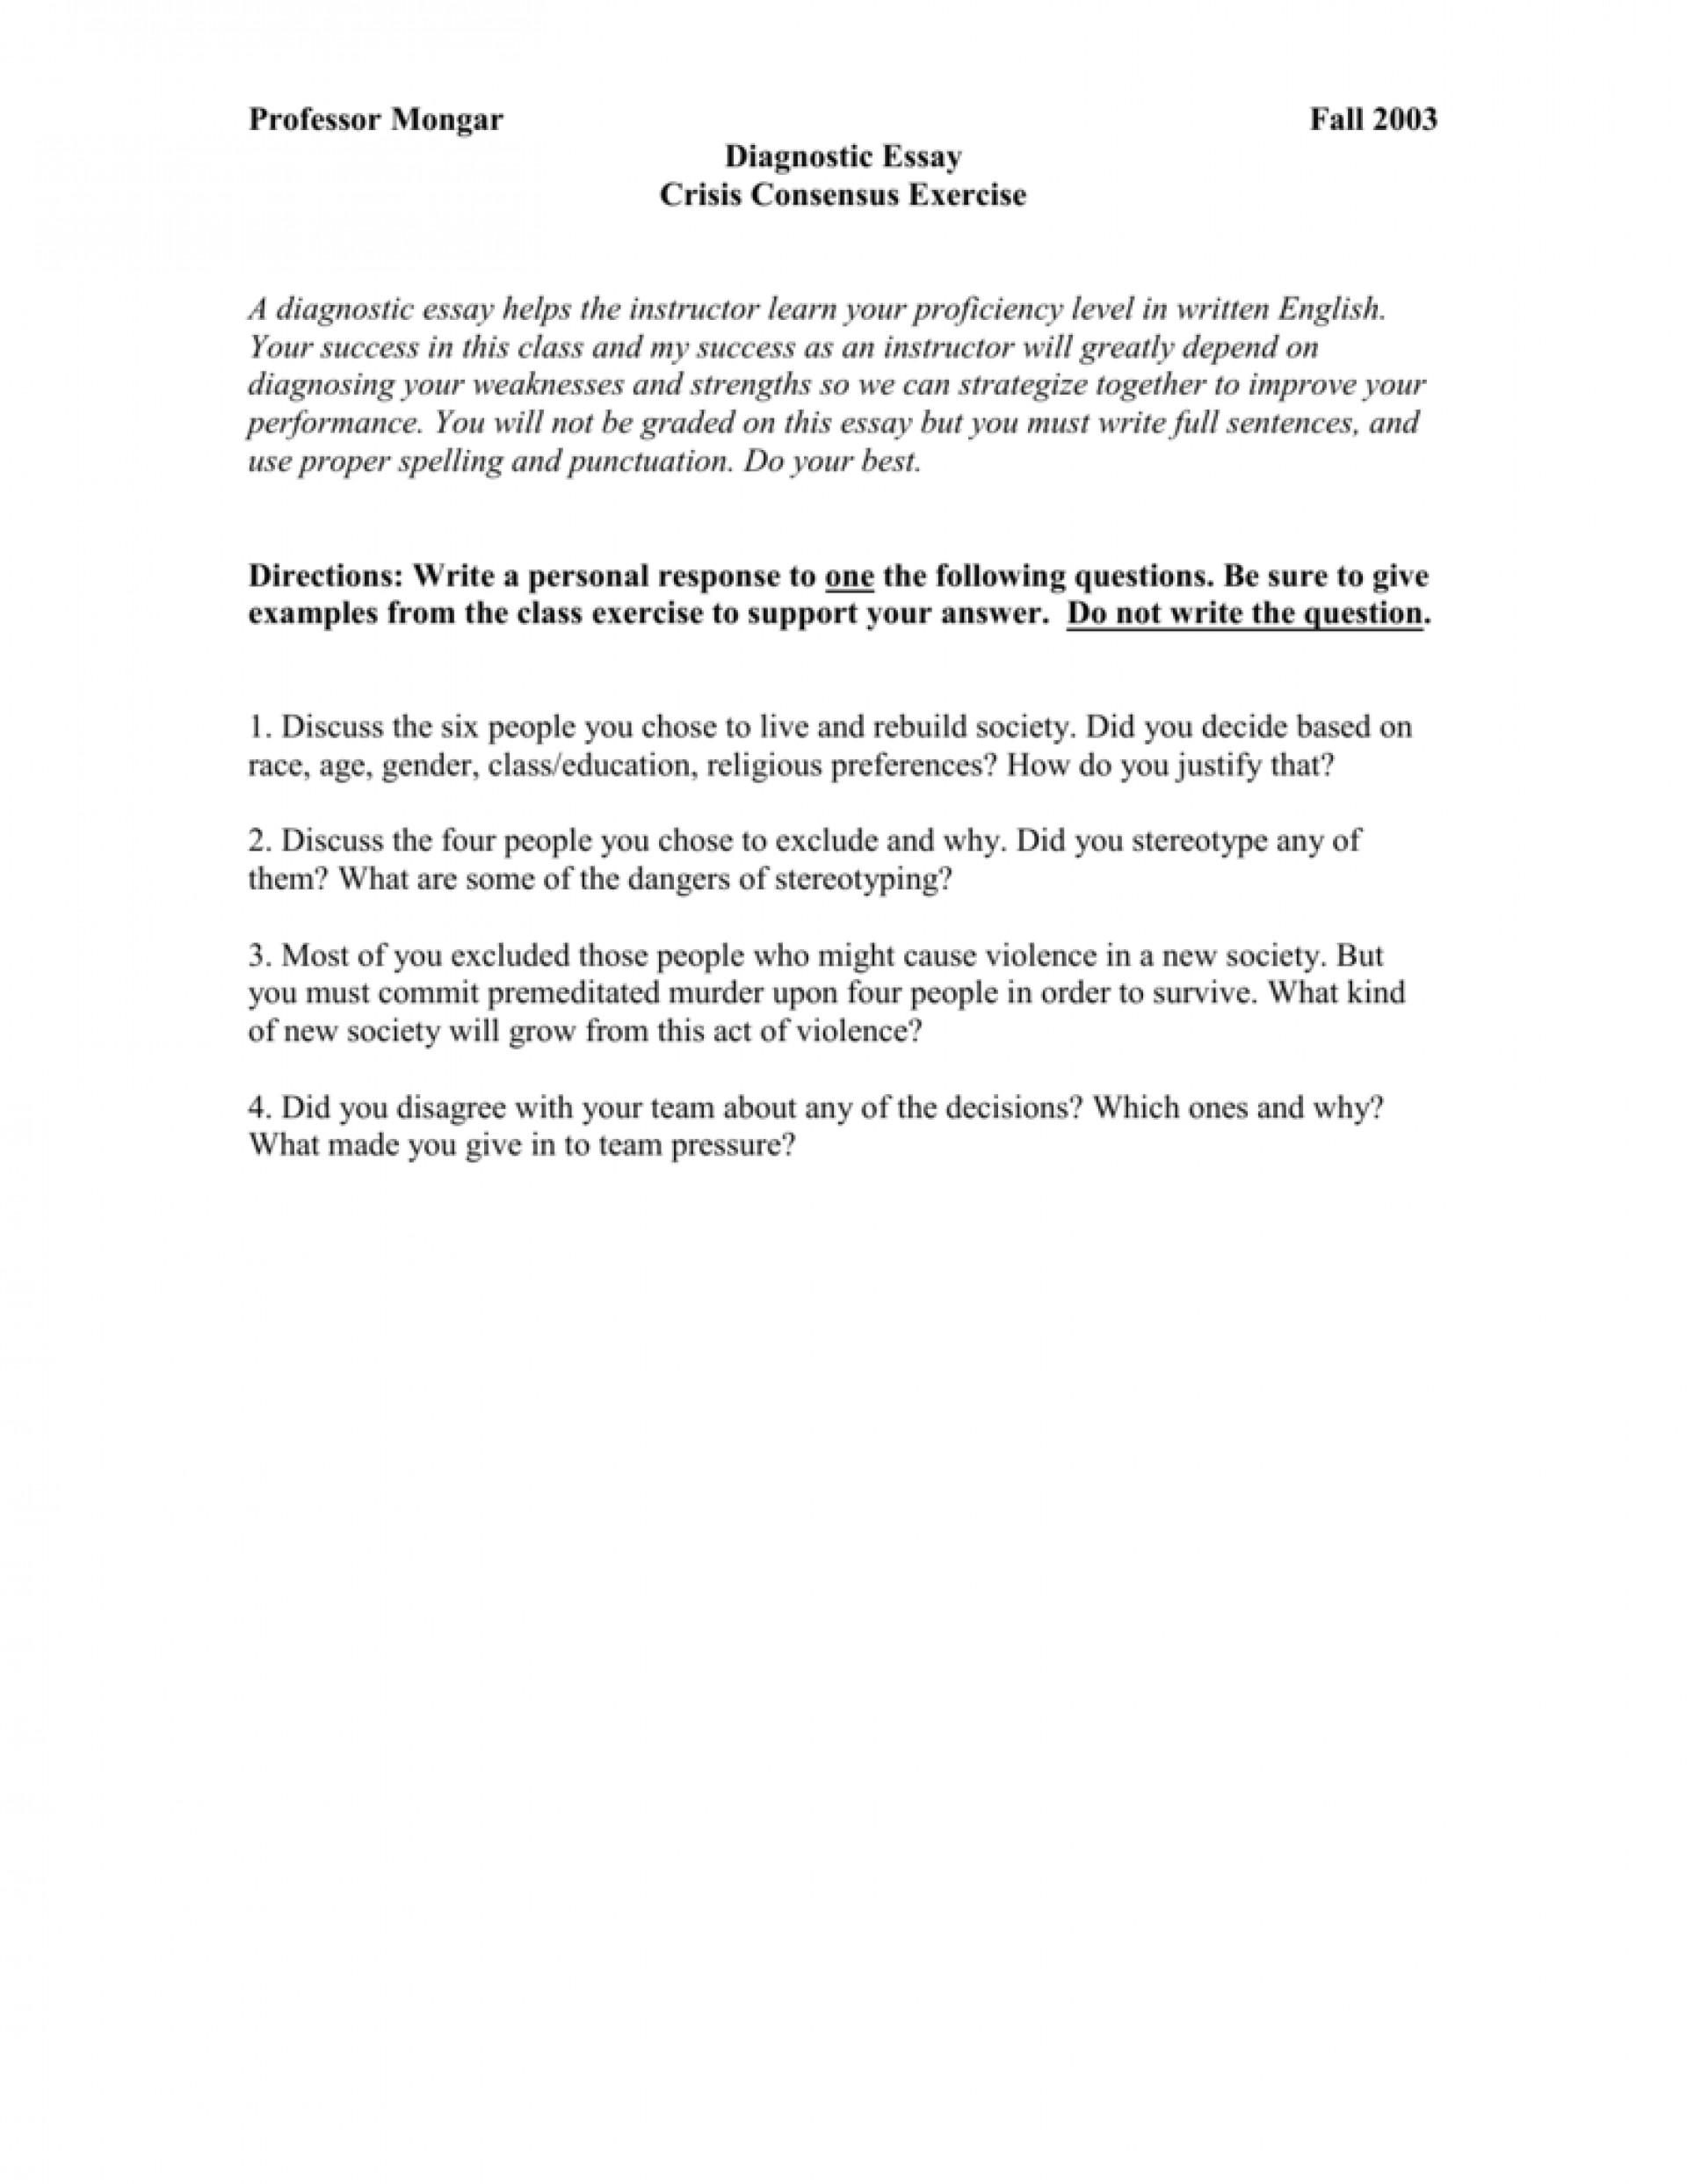 013 008051743 1 Diagnostic Essay Wondrous Writing Prompts High School Topics Introduction 1920